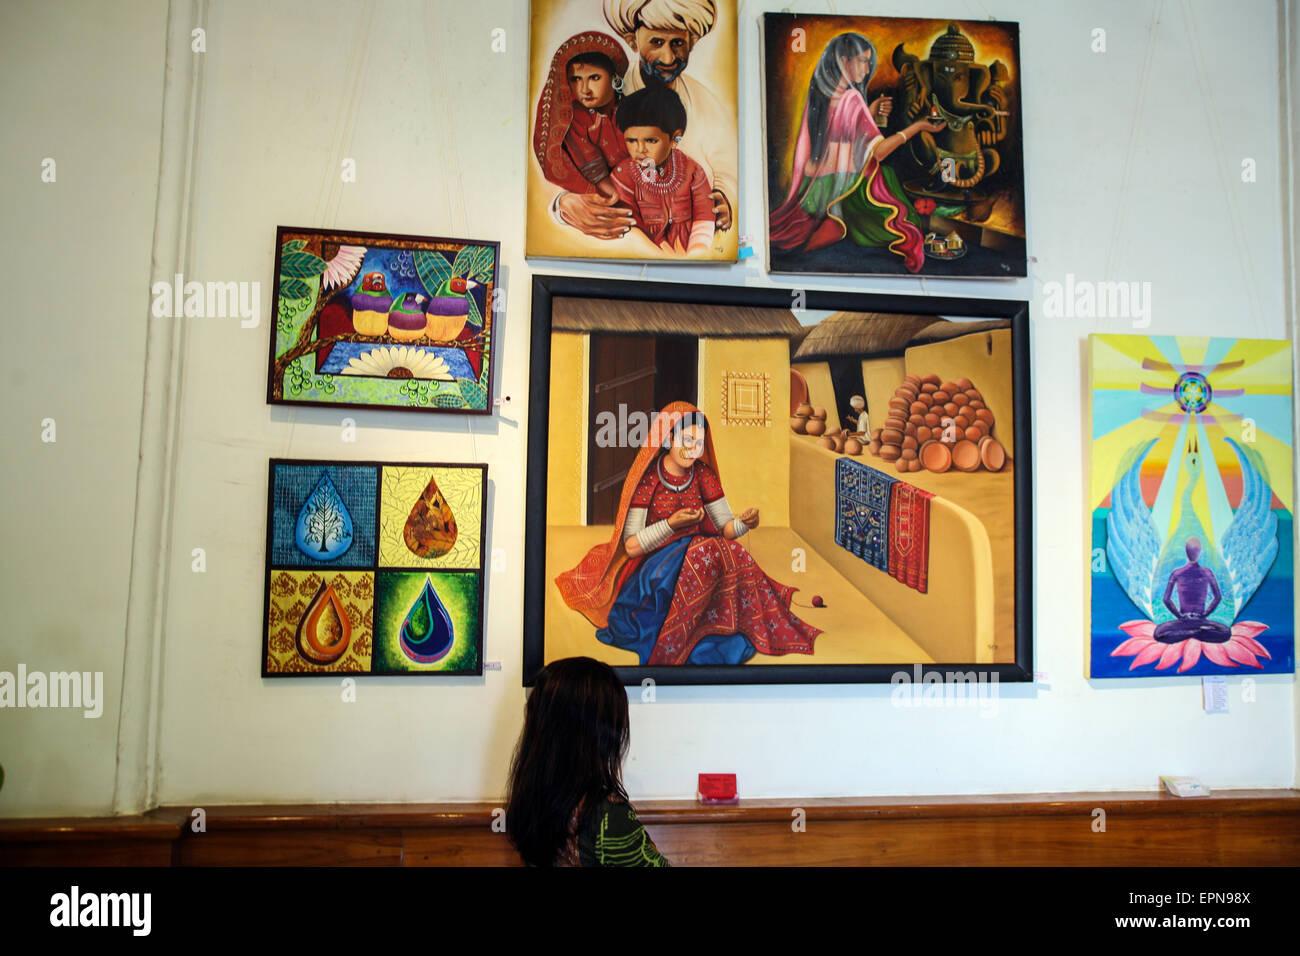 Painting Art Gallery In Mumbai